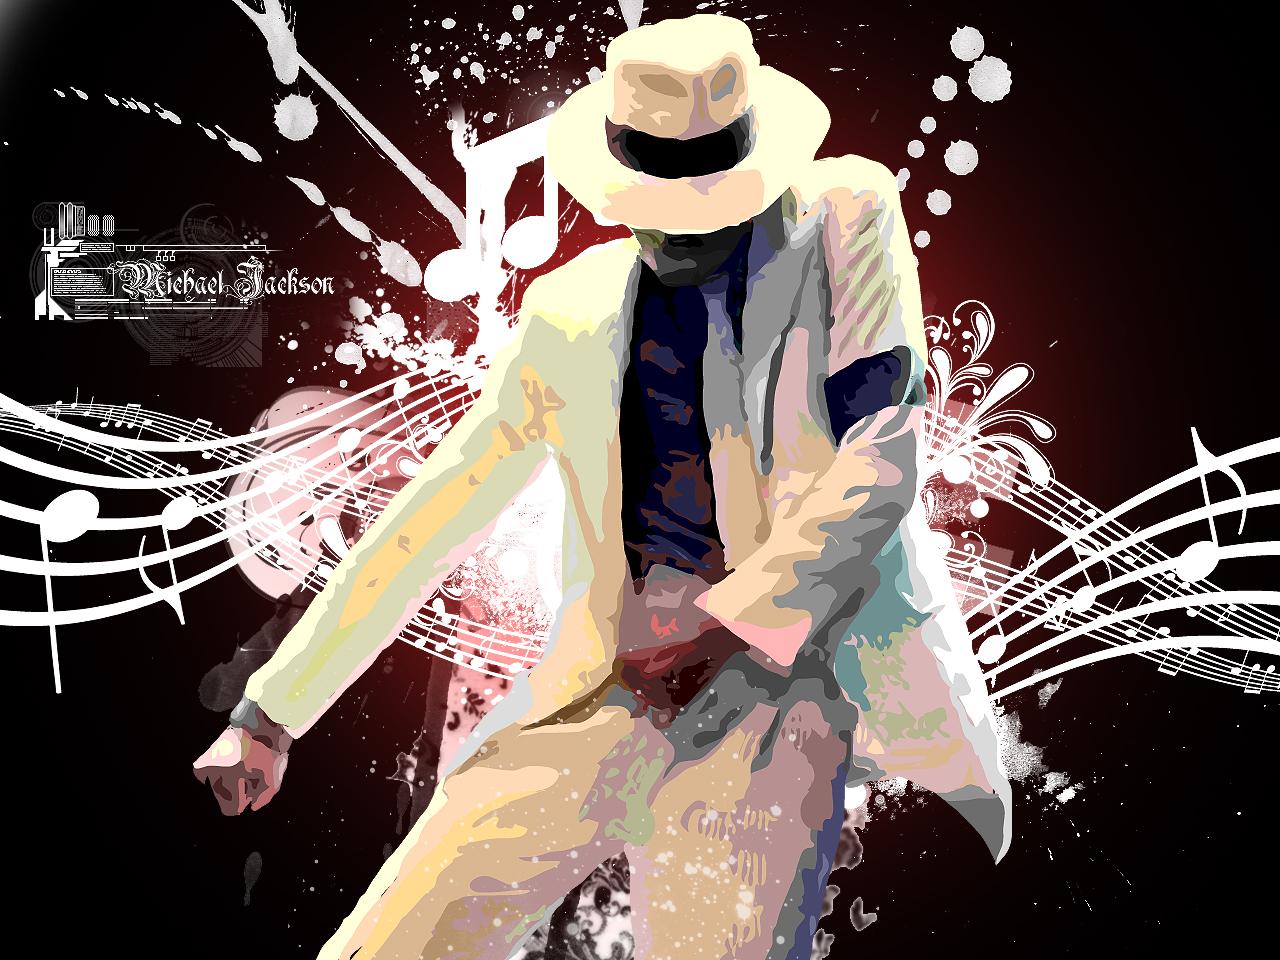 http://4.bp.blogspot.com/-VbtWCKpwiJQ/T7OhEoGdH0I/AAAAAAAAABo/jgZaWIIjmc4/s1600/michael_jackson_rock_dance-wallpapers-252540lahari.net.jpg